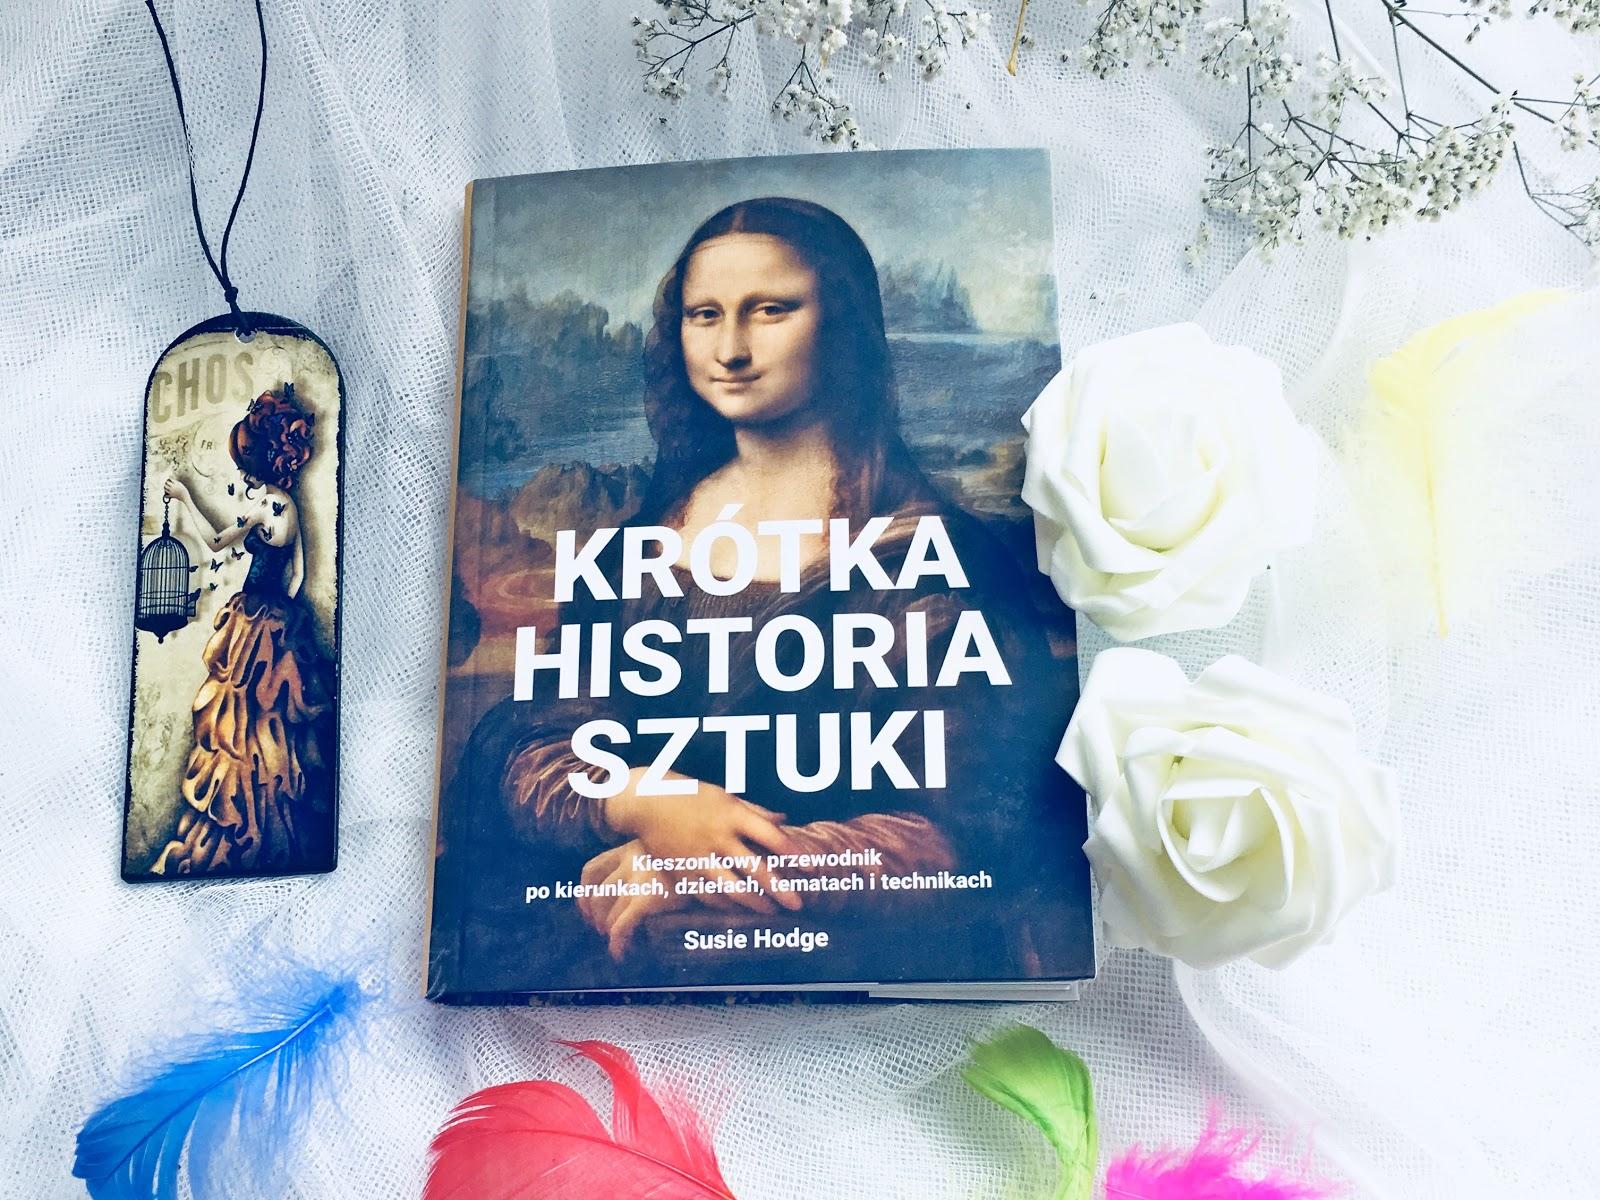 Krótka historia sztuki – Susie Hodge. Kieszonkowa Mona Lisa